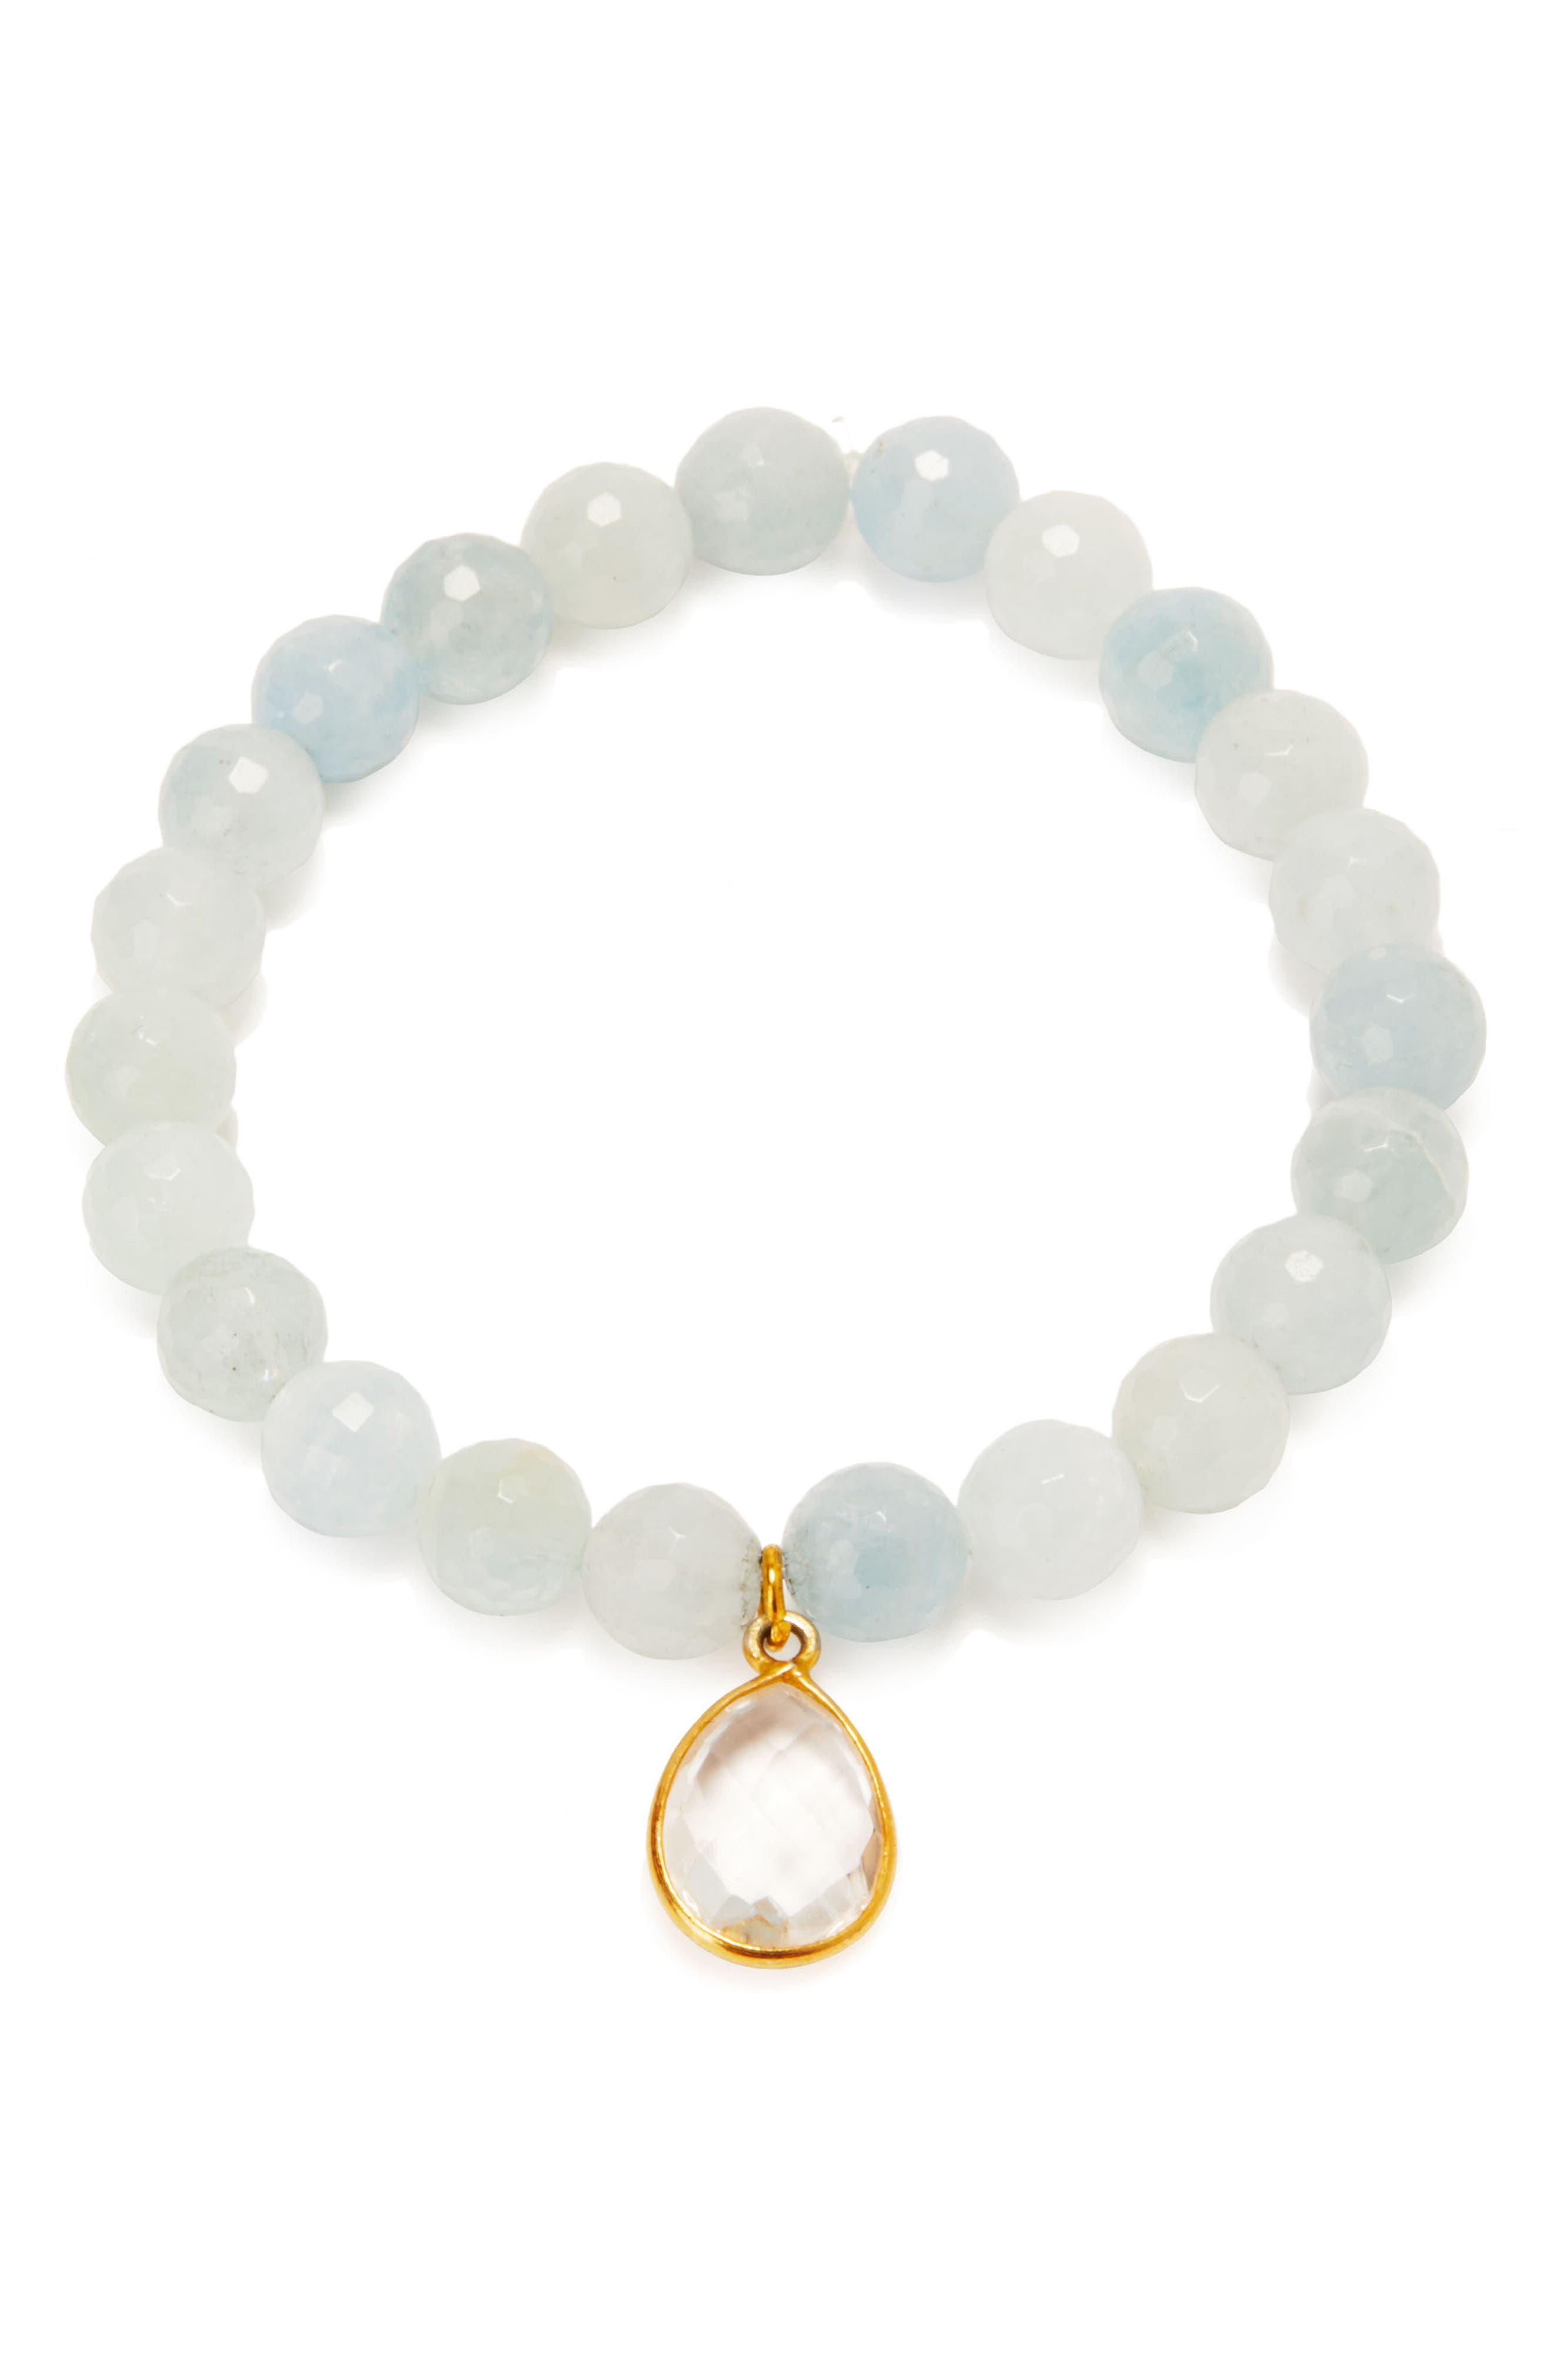 Malibu Semiprecious Stone Bracelet,                             Main thumbnail 1, color,                             401